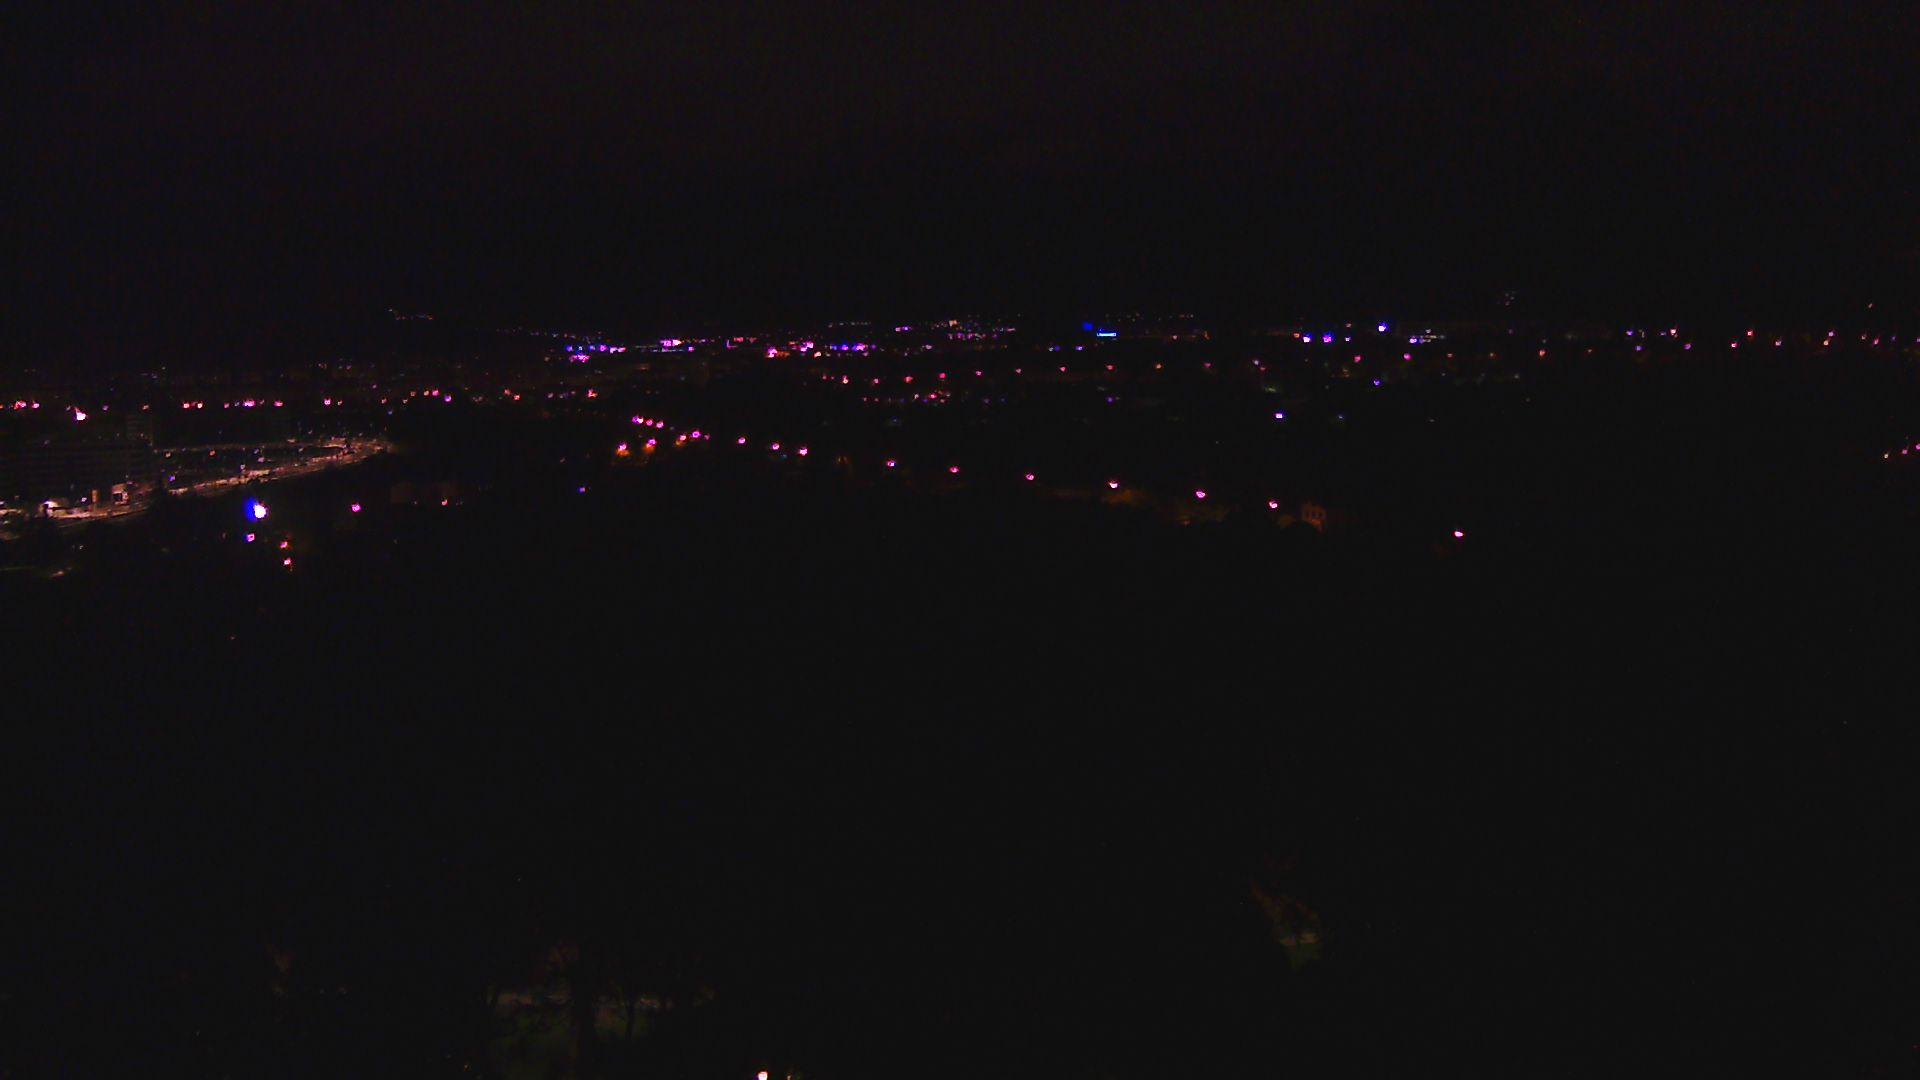 Pamplona So. 22:46